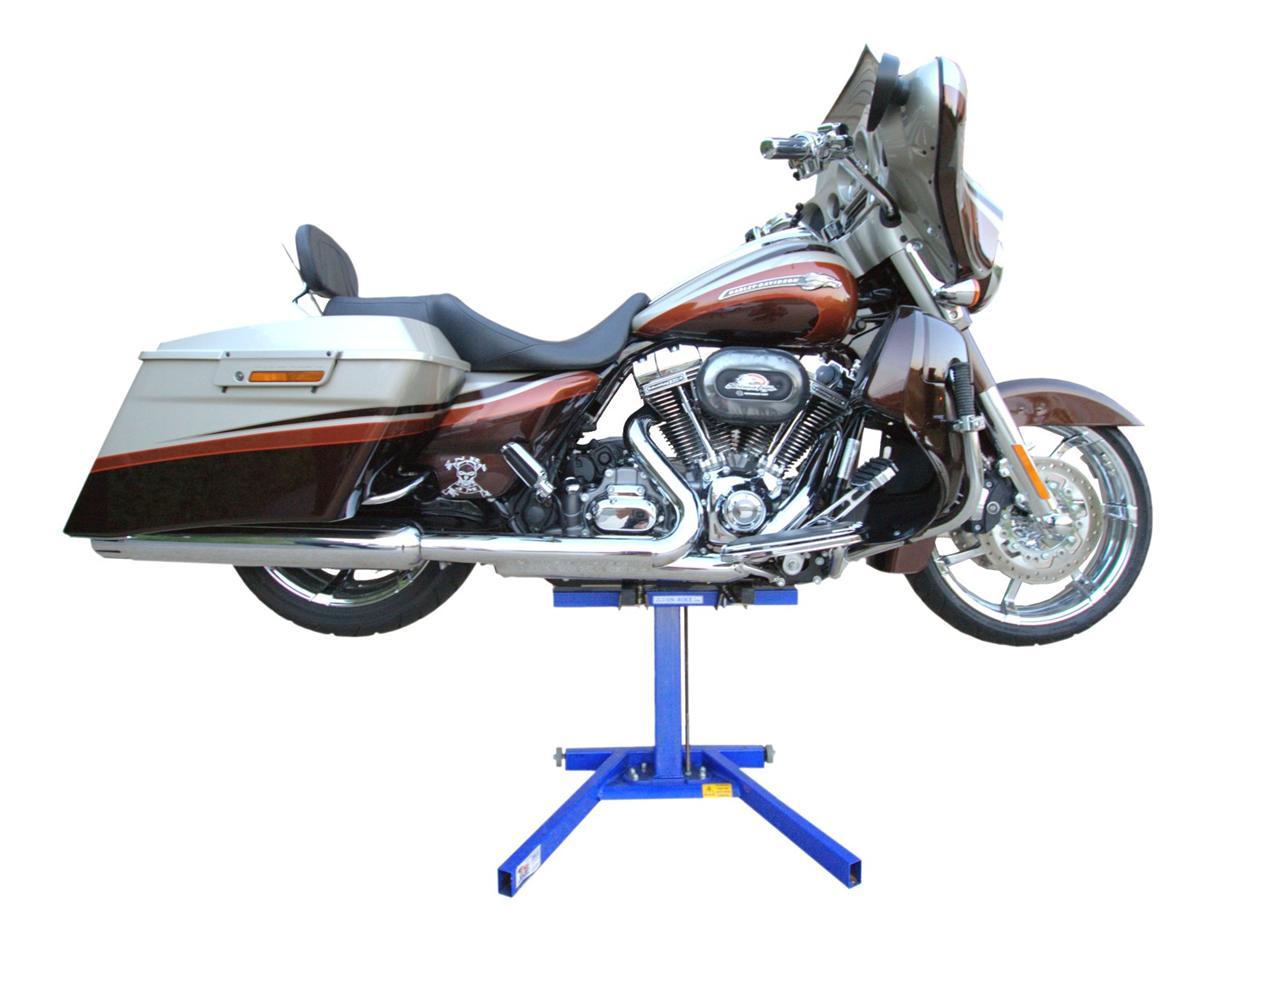 Best Motorcycle Lift : Motorcycle lift eazy rizer bigblue world best